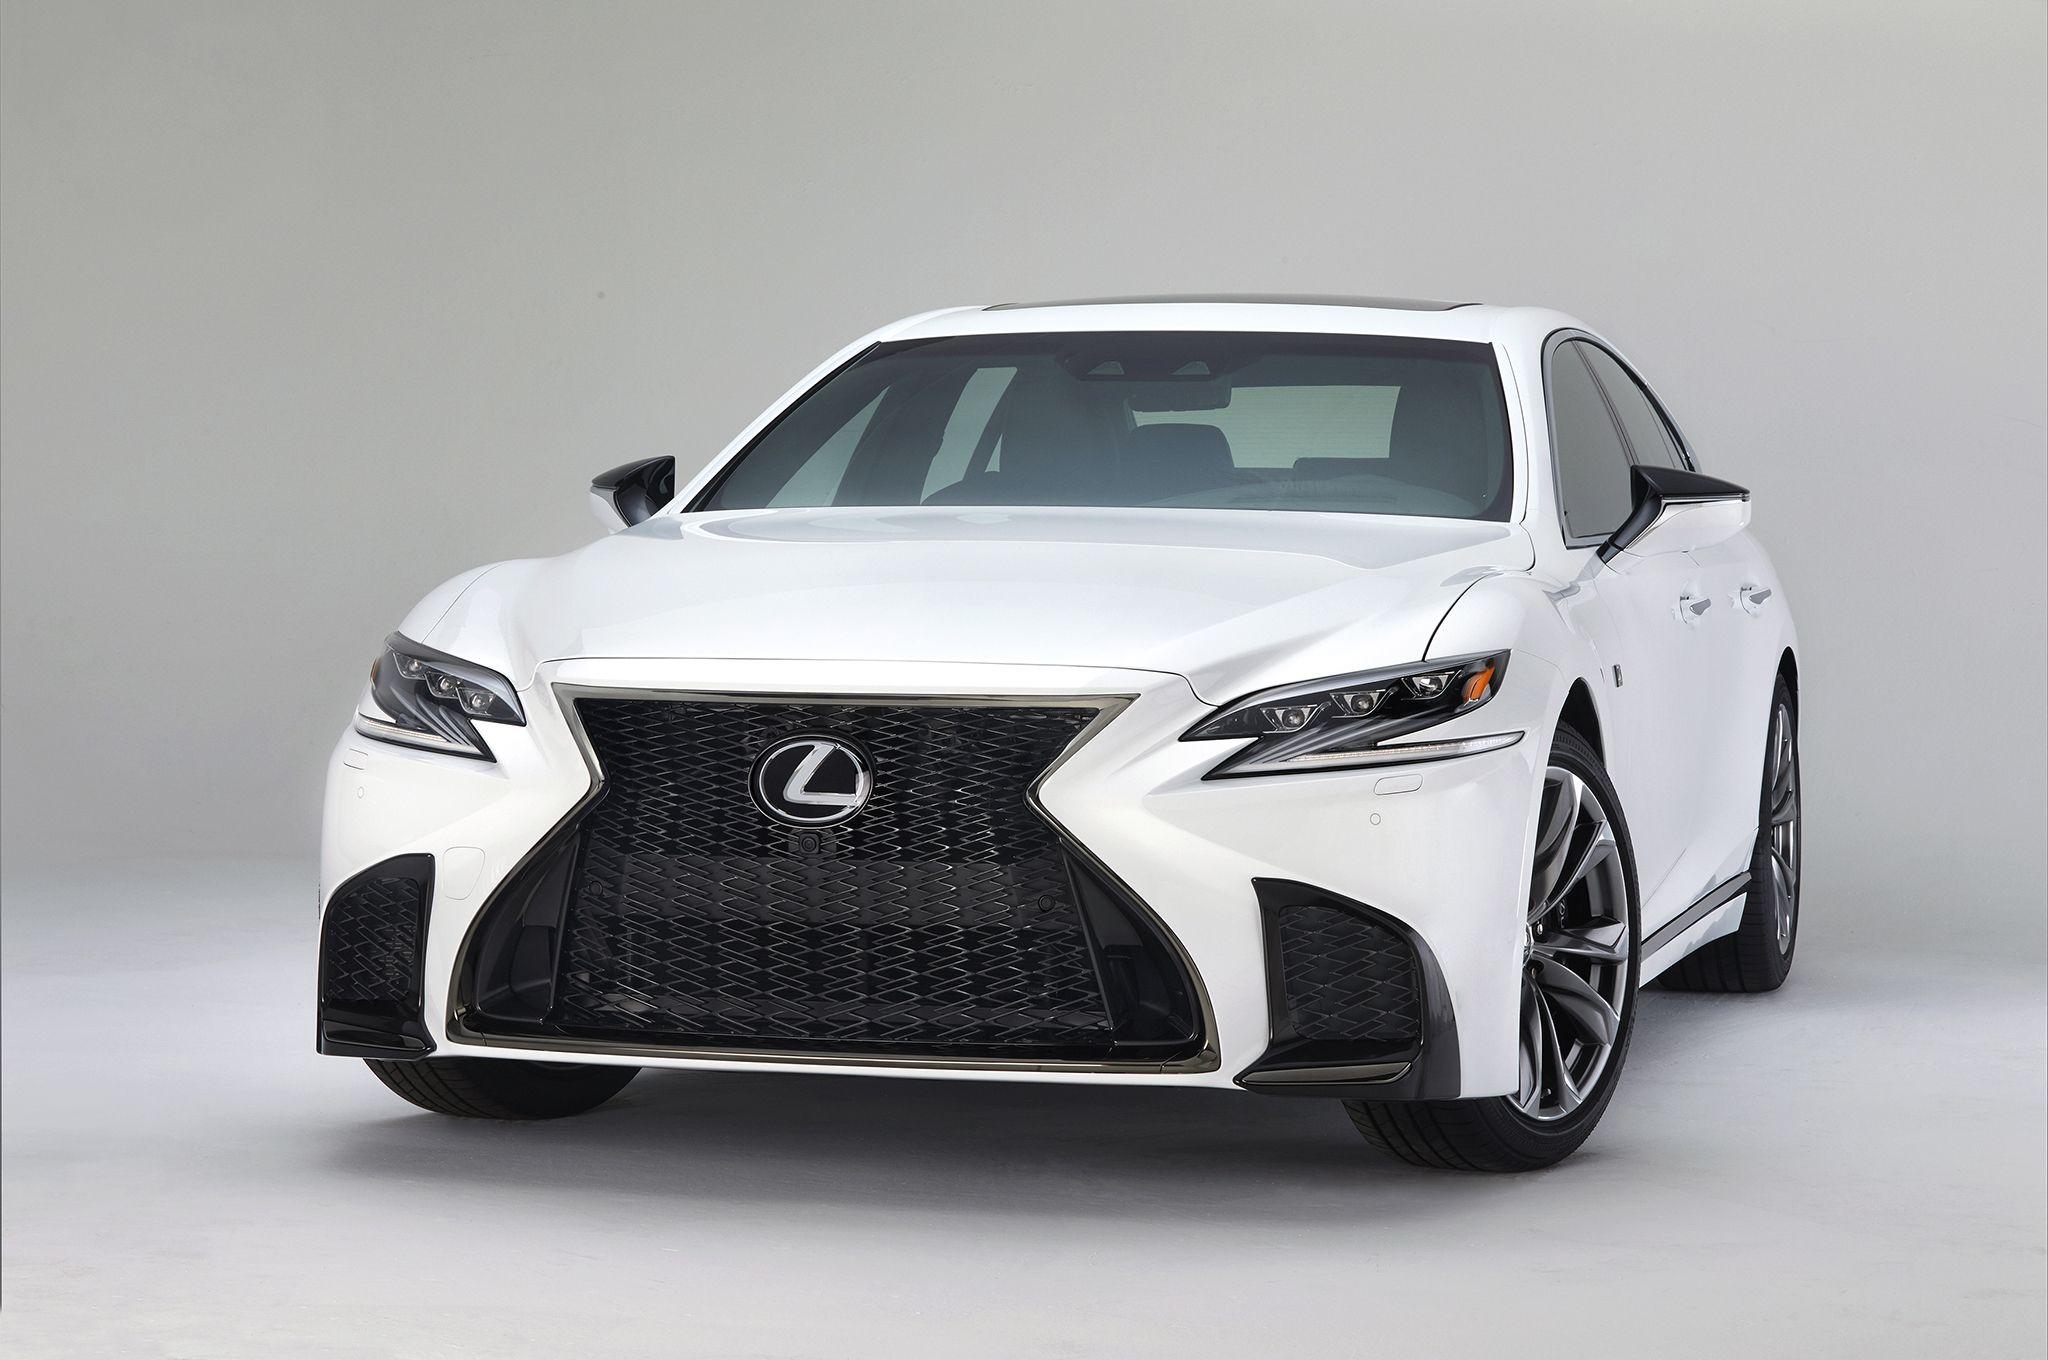 Following Geneva s debut of the hybridized 2018 Lexus LS 500h